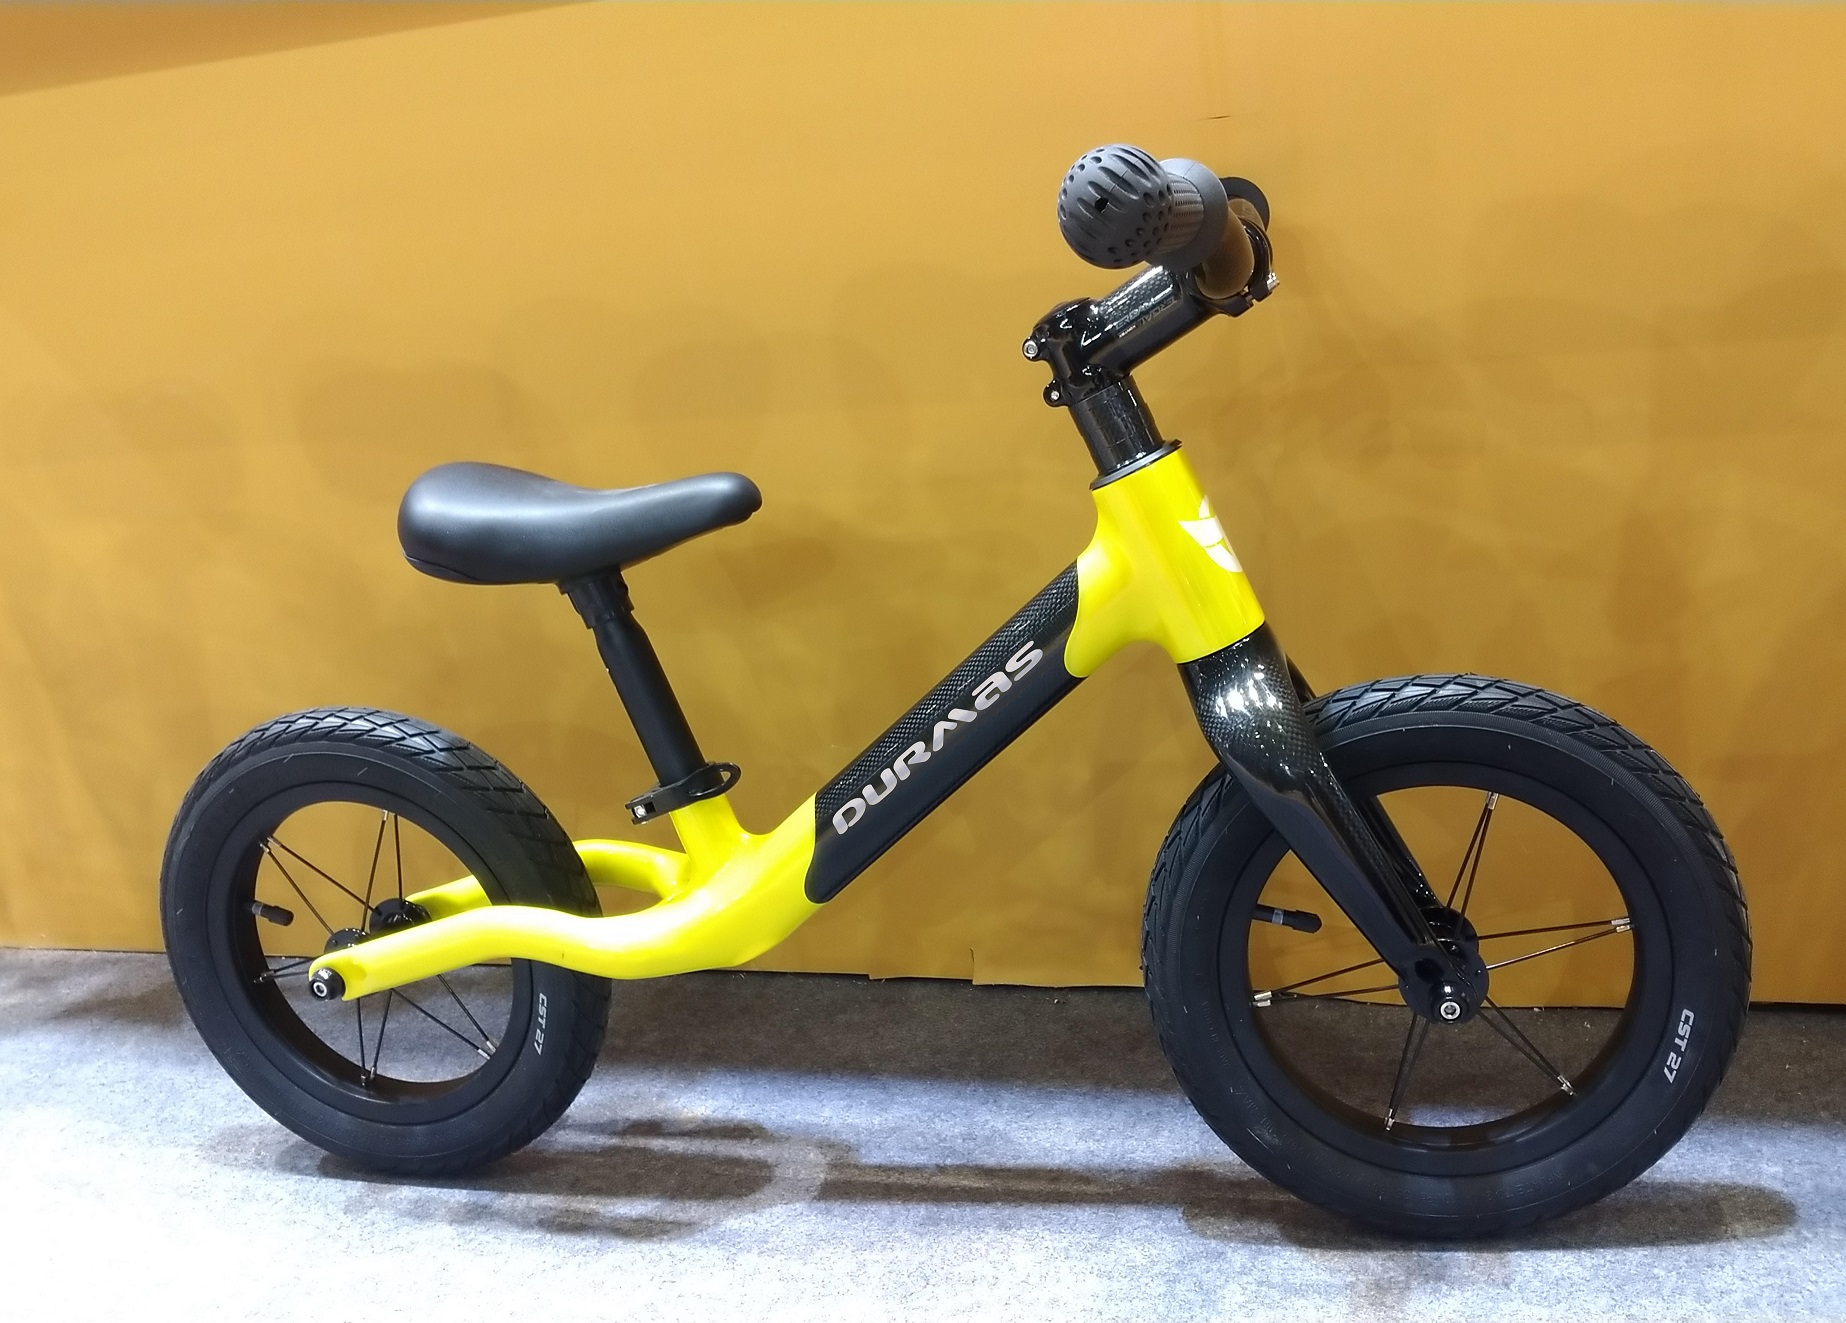 Taiwan Children Bike | DURMAS ENTERPRISE CO , LTD